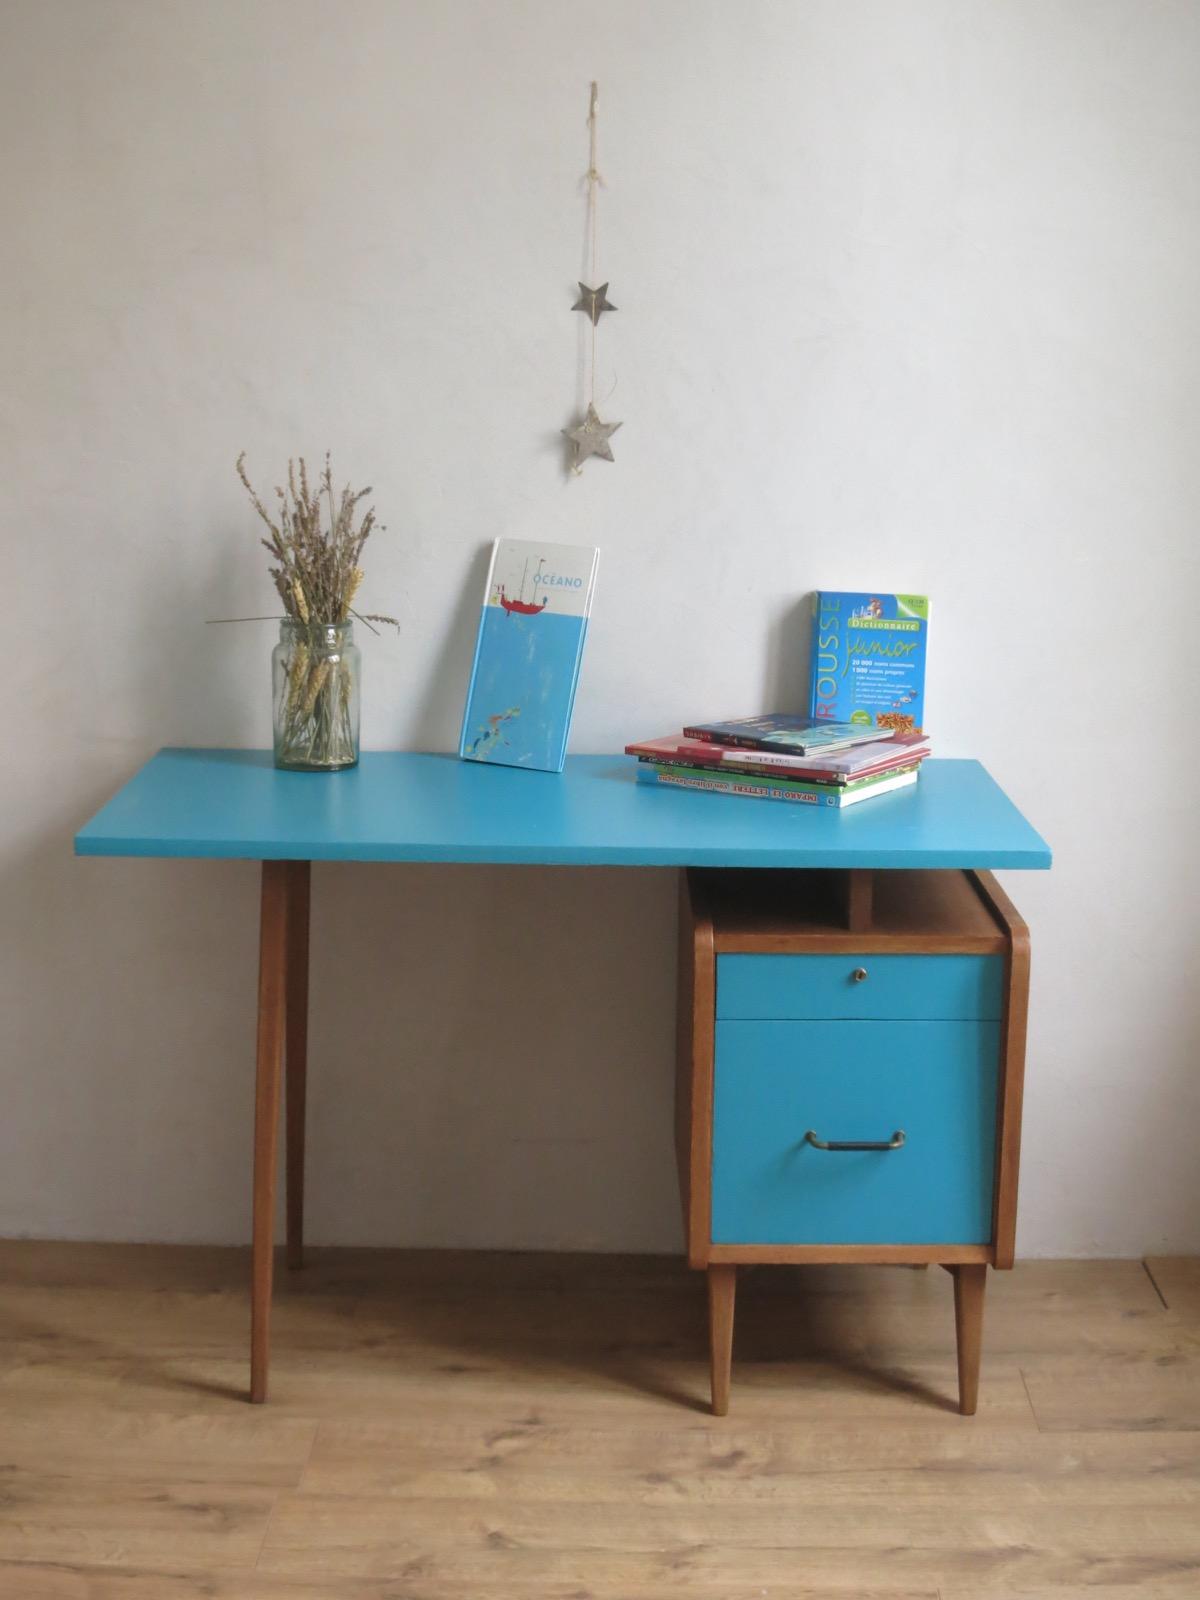 bureau estampill sam meubles du demi si cle vintage pieds compas. Black Bedroom Furniture Sets. Home Design Ideas